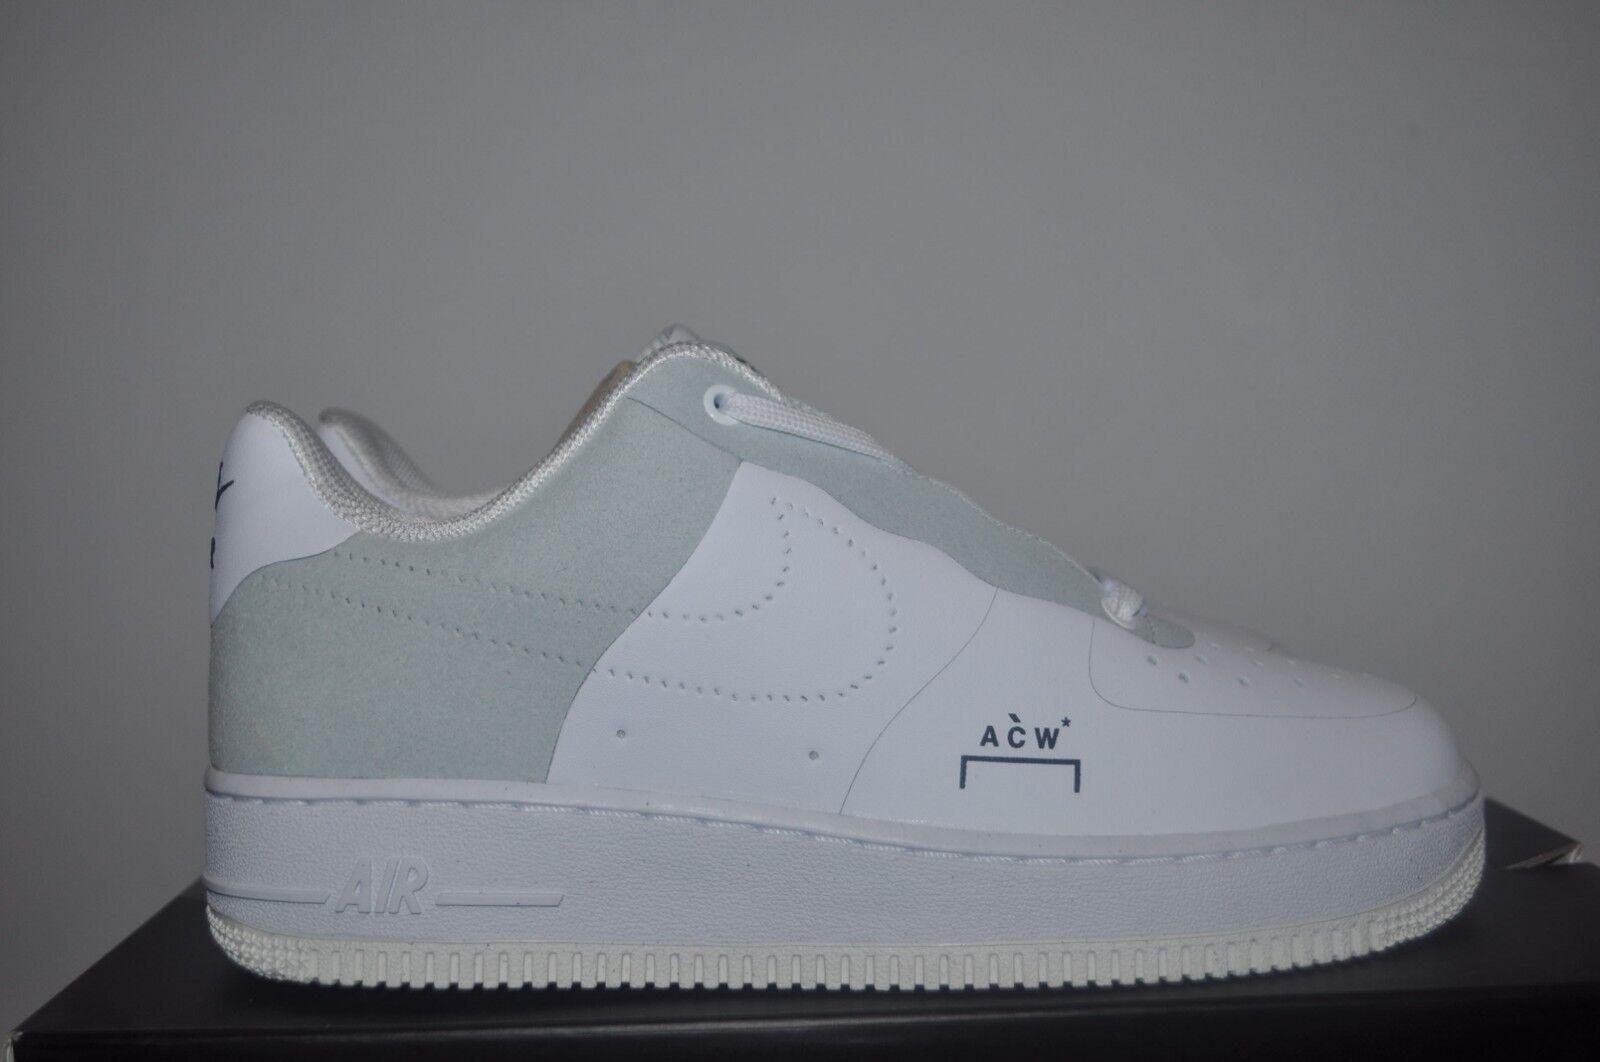 Nike Air Force 1 x A-Cold-Wall  Weiß   UK6 US7 EU40 AF1 ACW Samuel Ross Low Gute Qualität